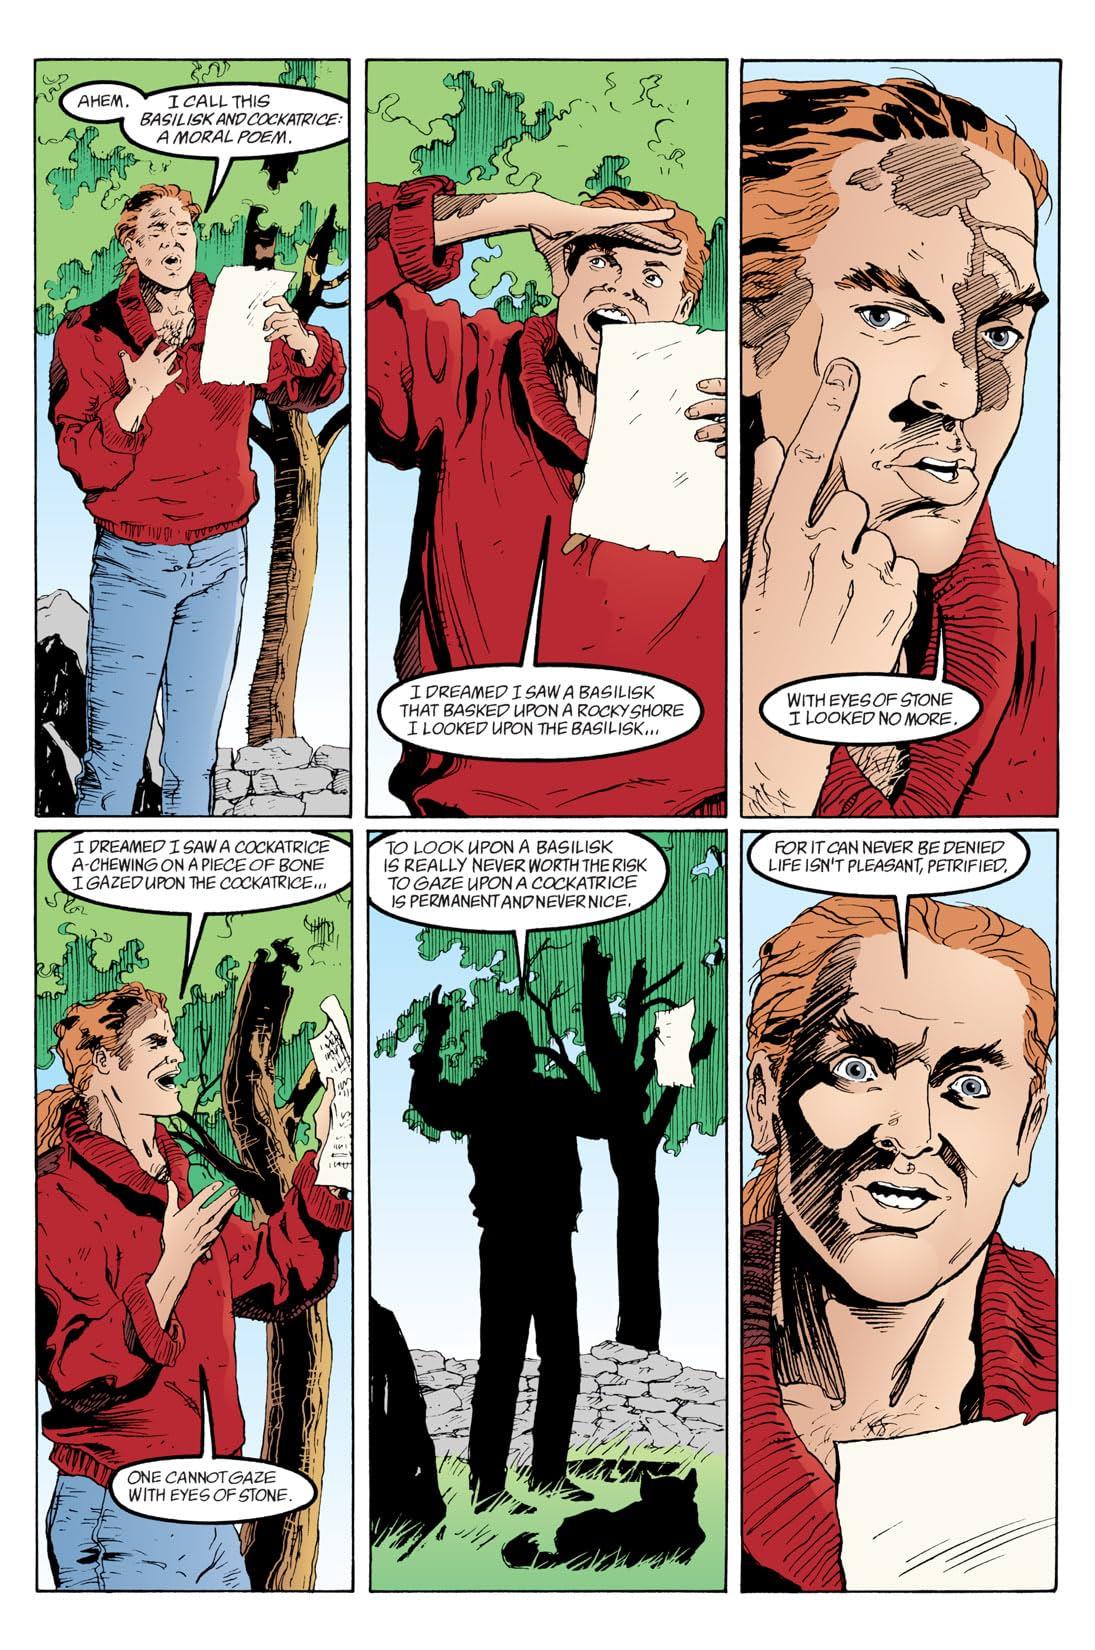 The Sandman #46